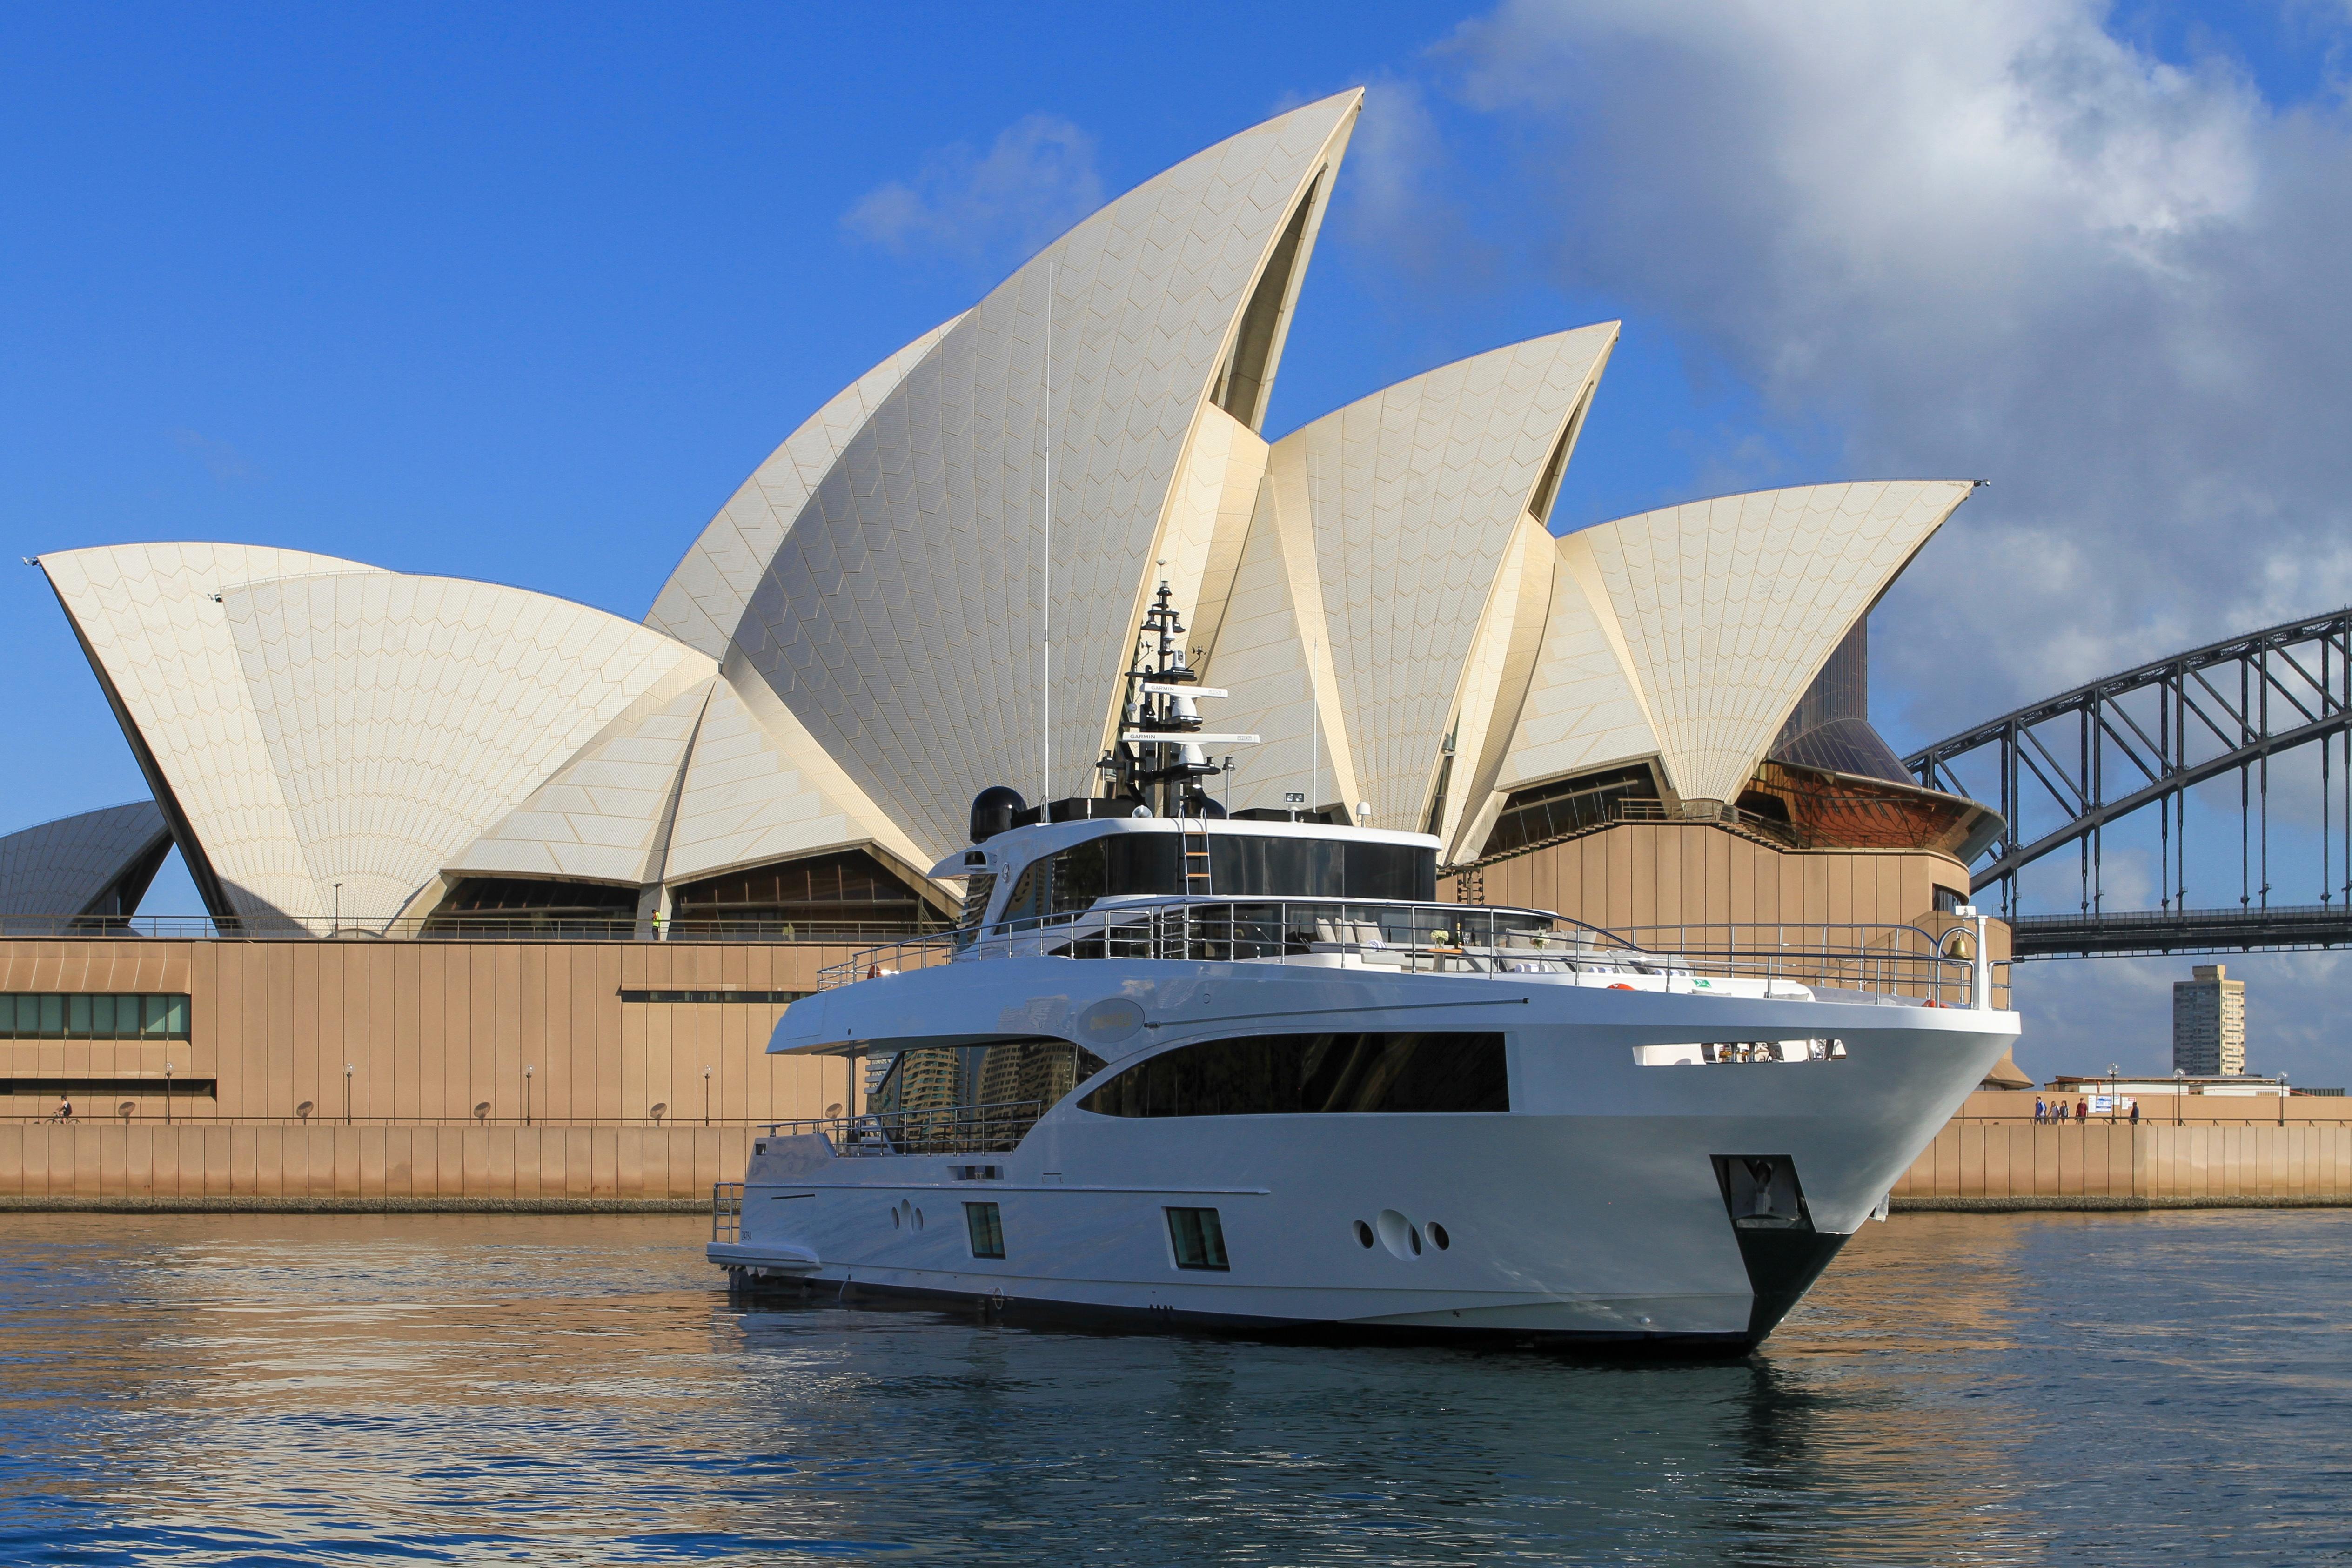 Majesty 100-3 MY Oneworld Sydney Harbour 7 April 2018 Richard Morris Australian Superyachts (199).jpg